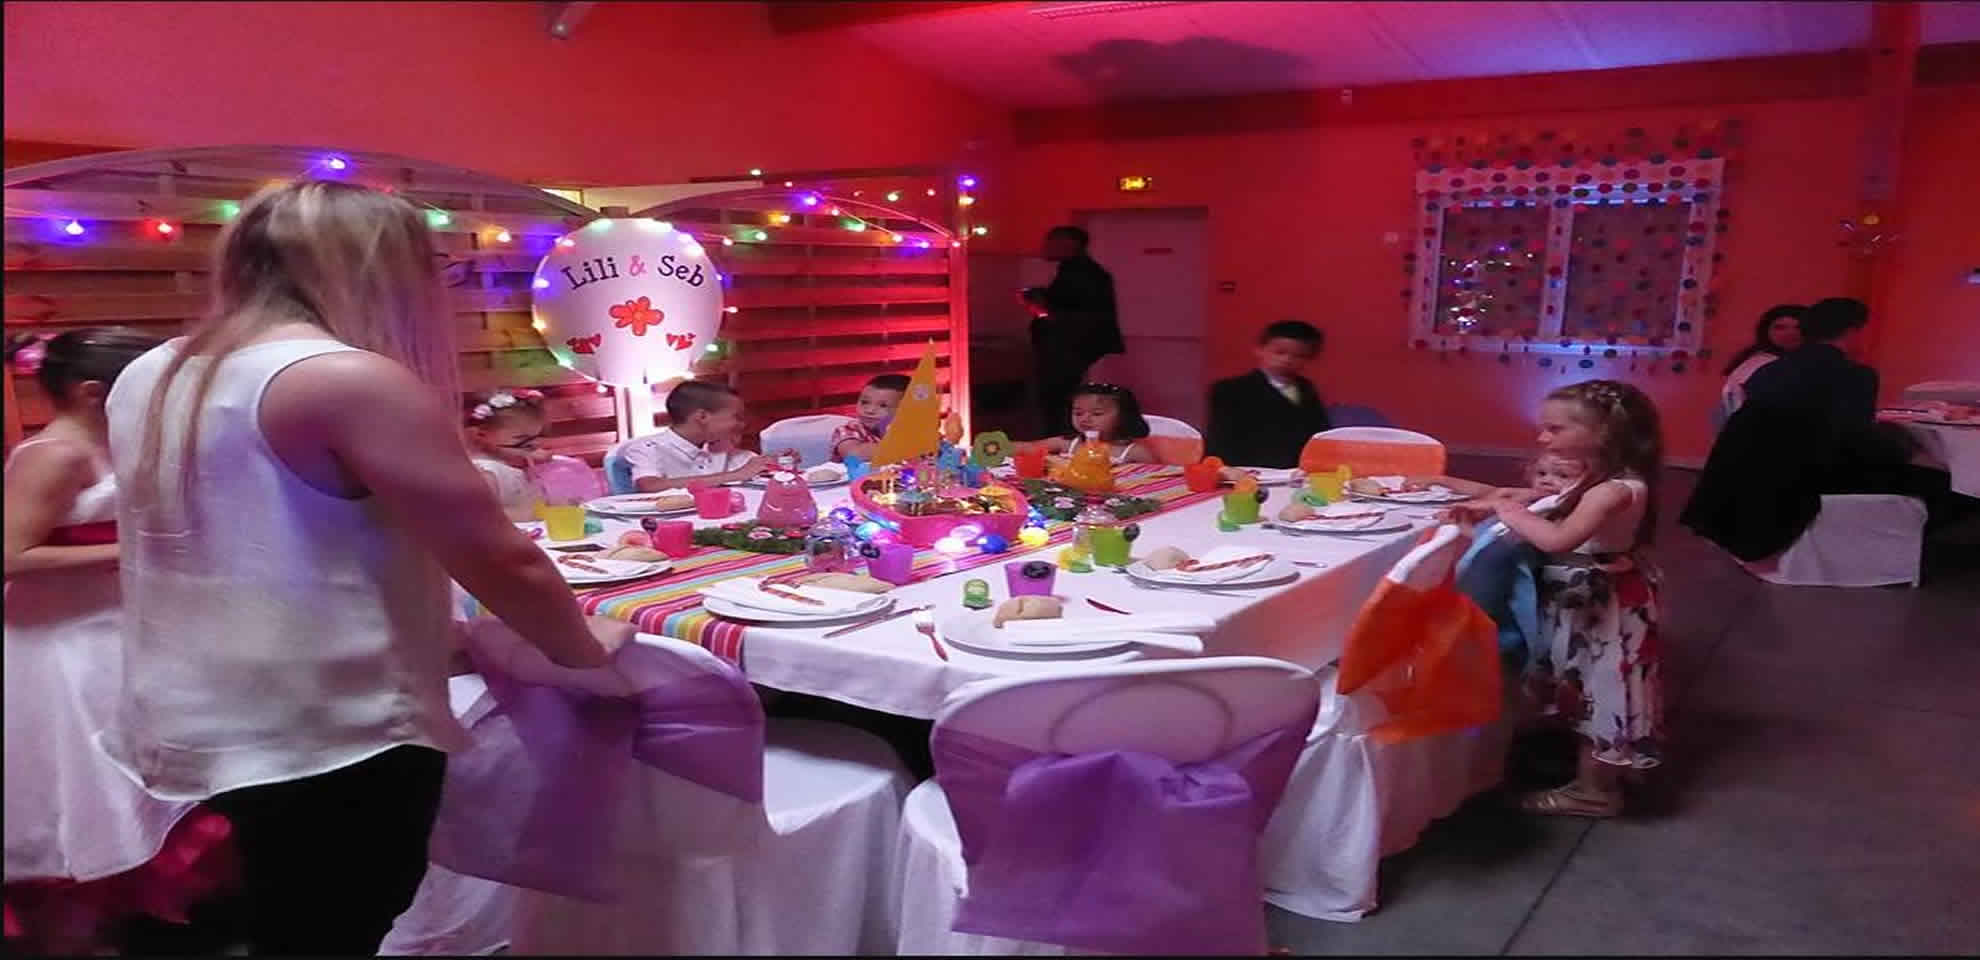 Le Club des Baby Sitters : atelier maquillage, séminaire, mariage